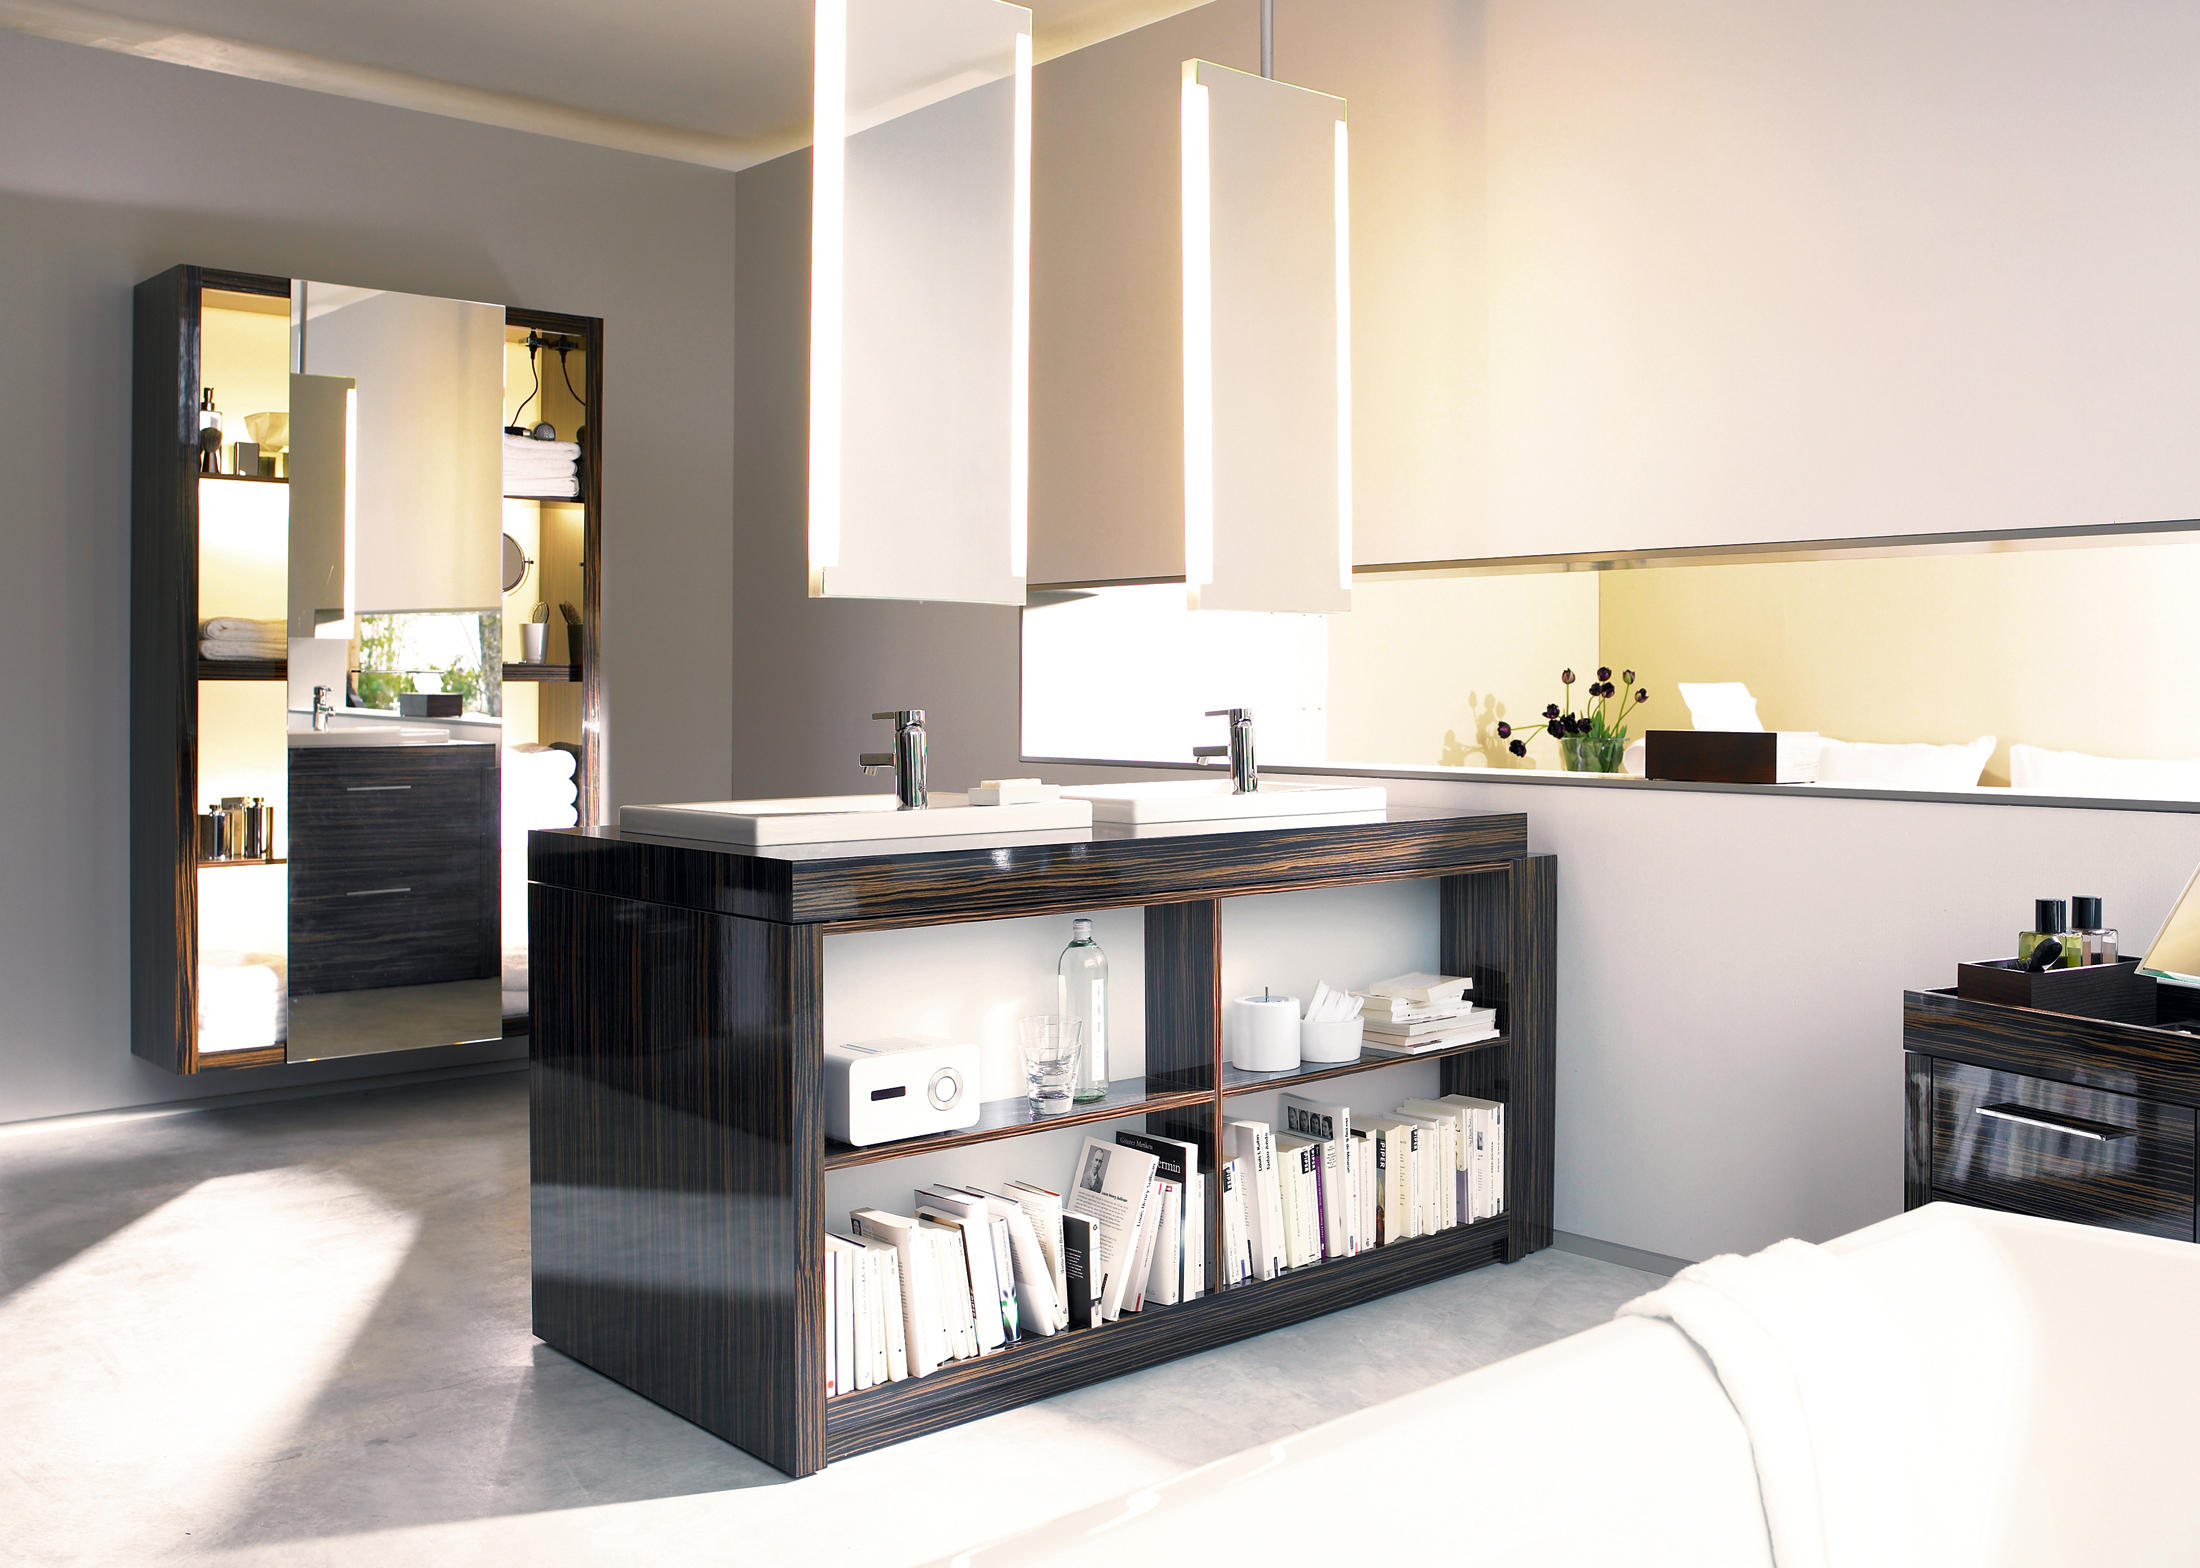 2nd floor lavabo lavabos de duravit architonic. Black Bedroom Furniture Sets. Home Design Ideas